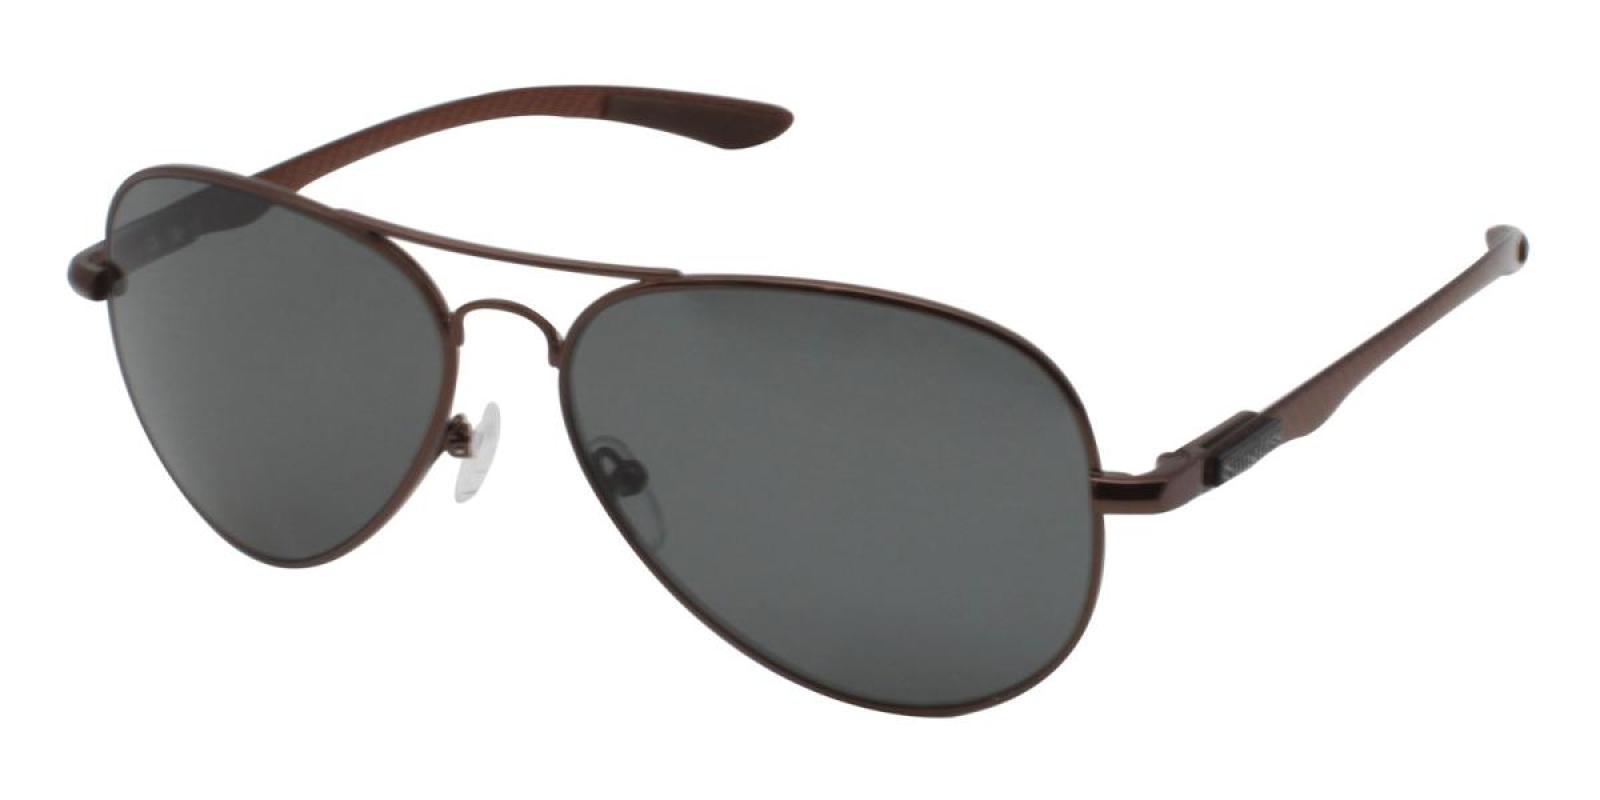 Mckain-Brown-Aviator-Metal-Sunglasses-additional1